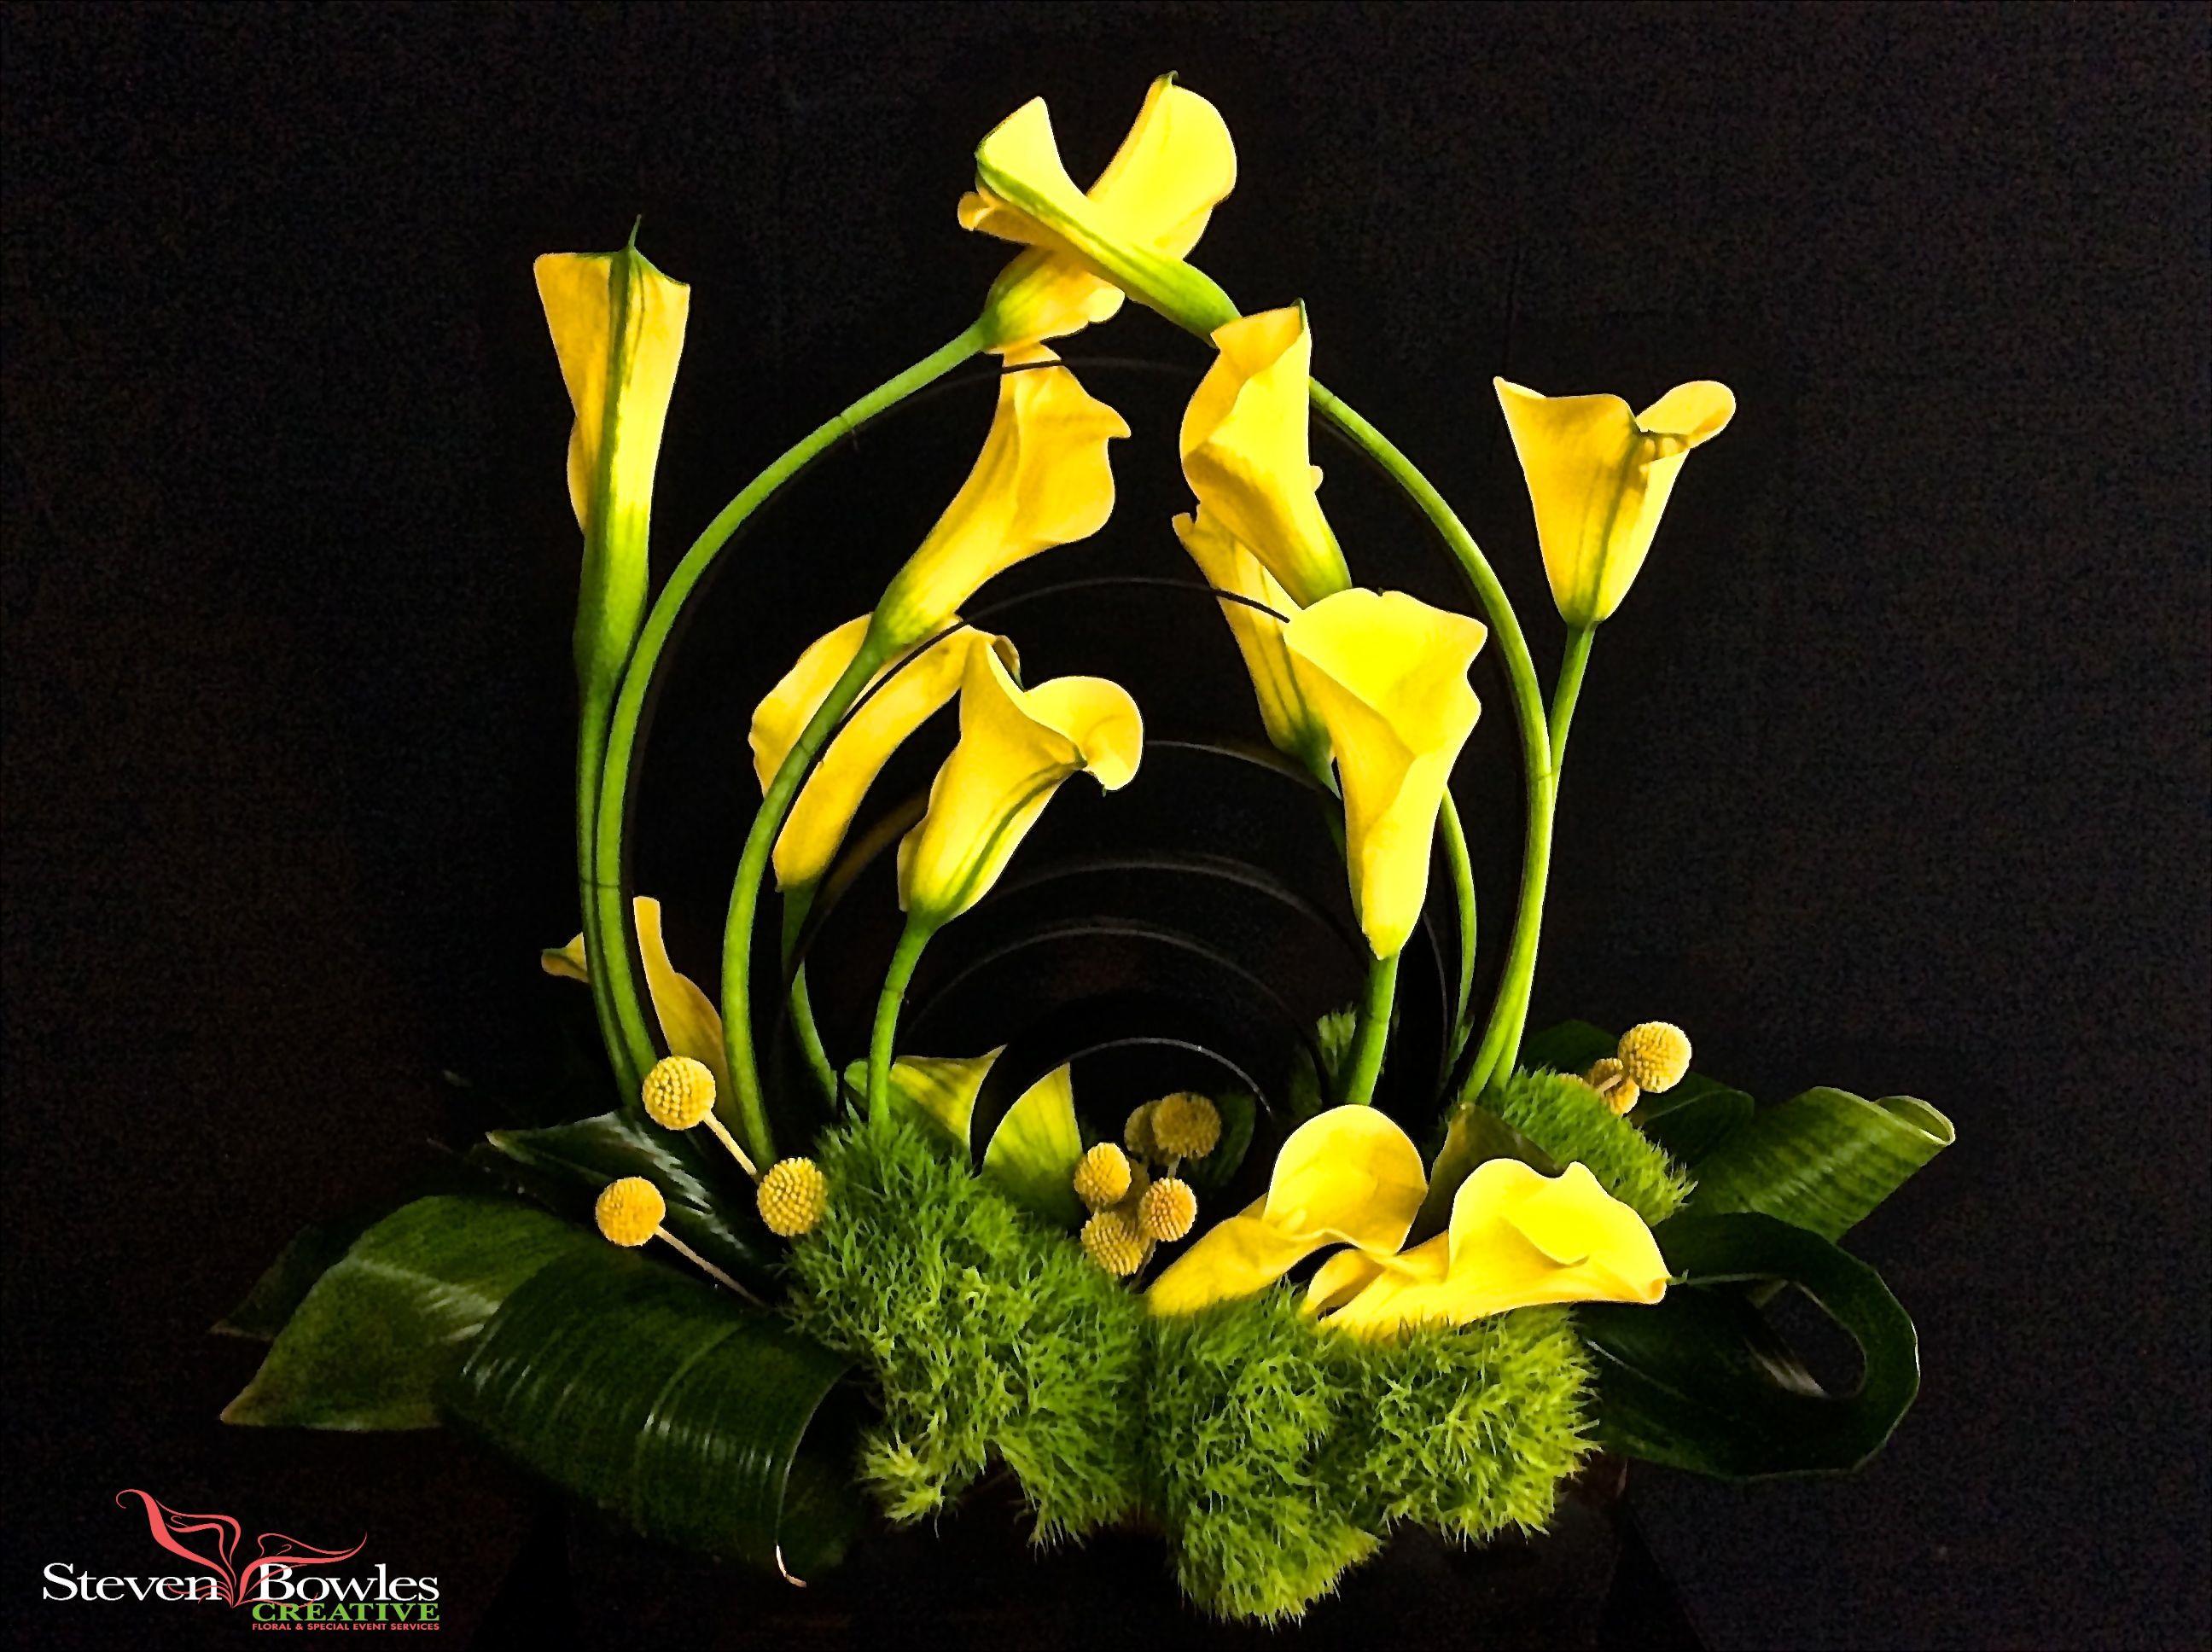 Contemporary Modern Flower Arrangement Yellow Calla Lily Floral Arrangement Designed Flower Arrangements Yellow Flower Arrangements Modern Flower Arrangements